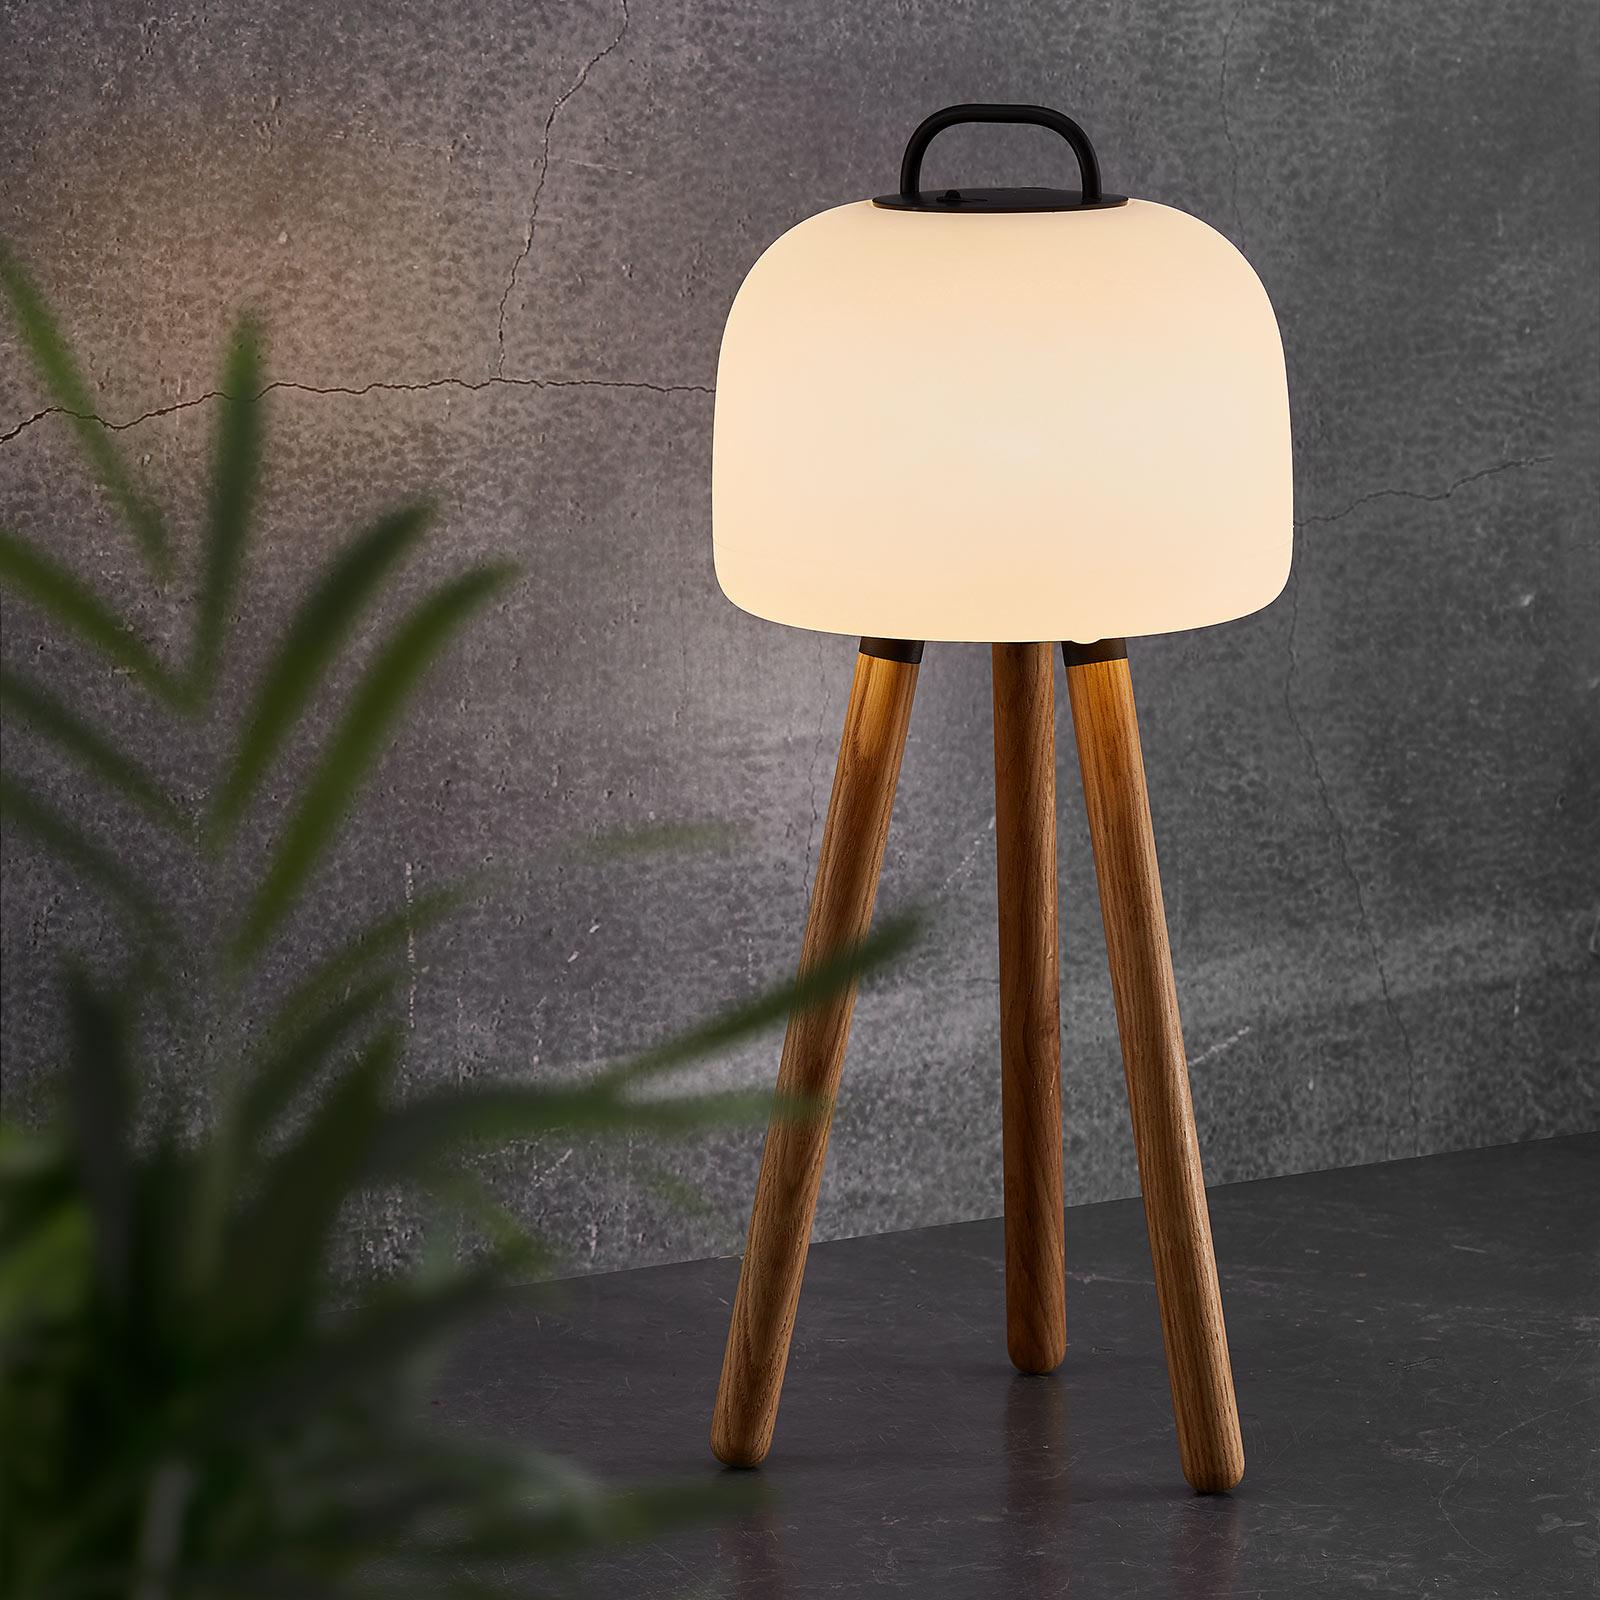 LED tafellamp Kettle tripod hout, kap 22cm